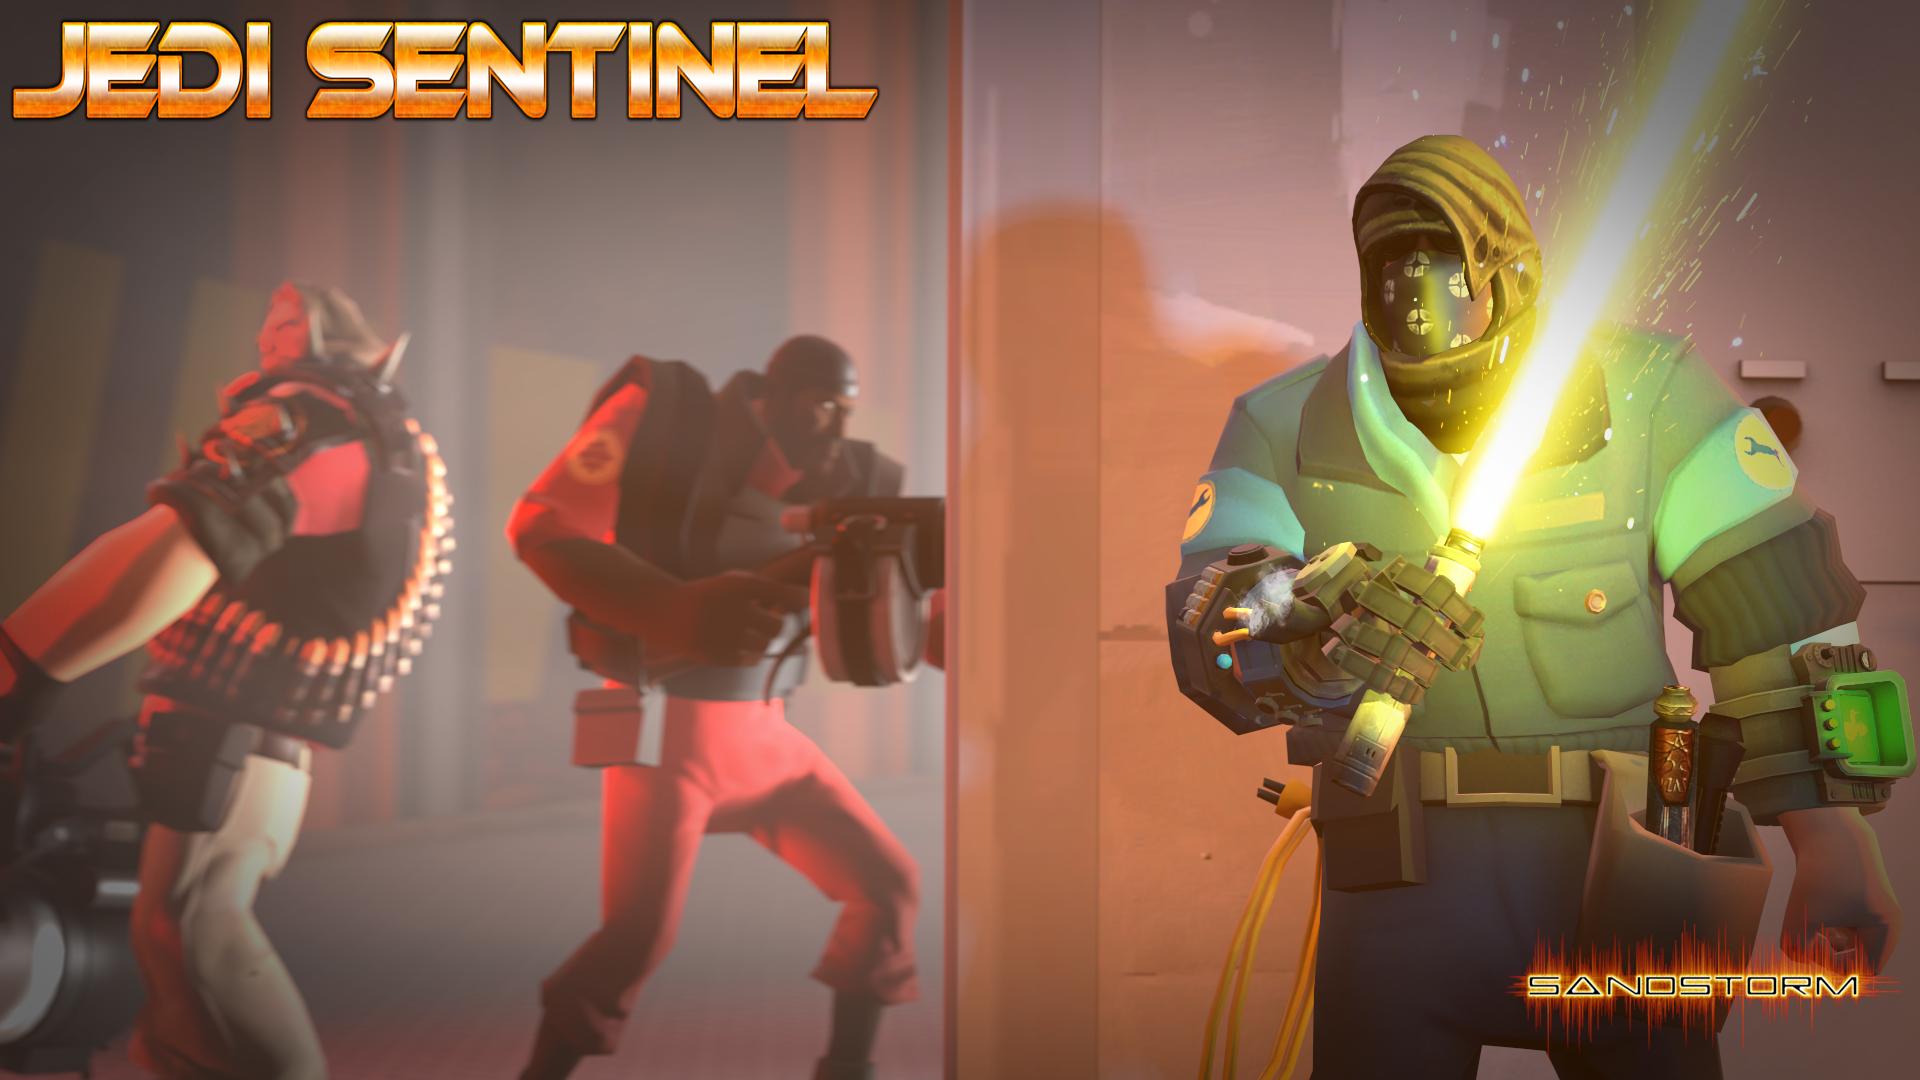 Jedi Sentinel [SFM] by Sandstorm-Arts